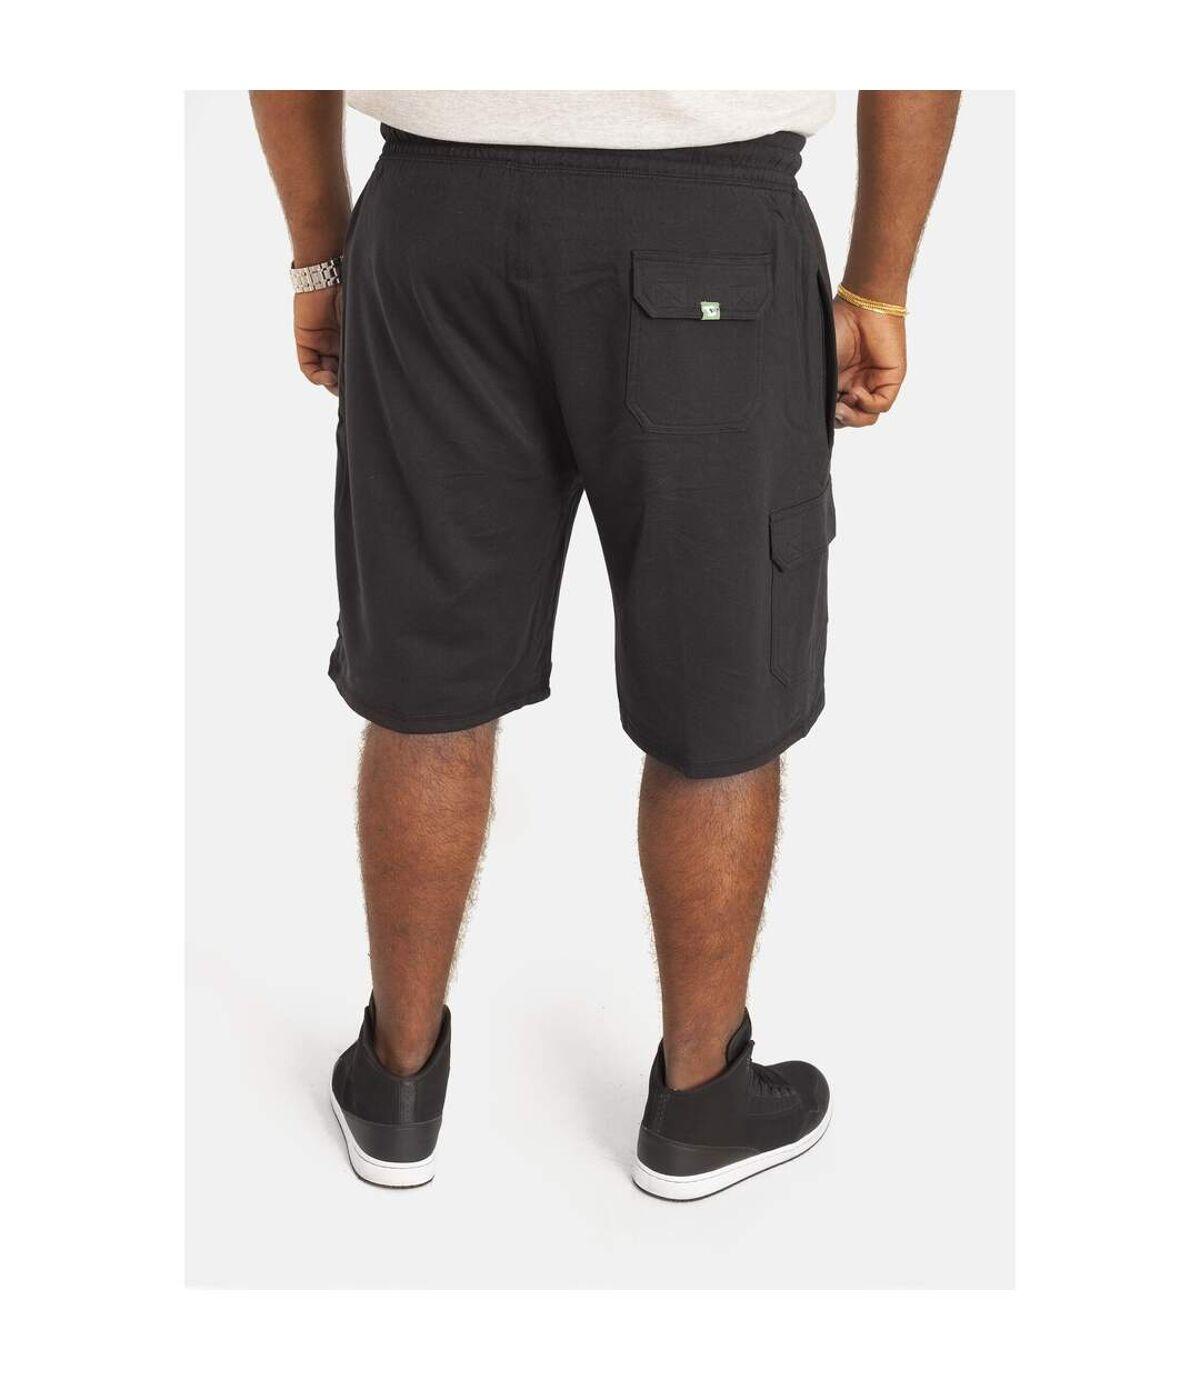 Duke Mens D555 John Kingsize Lightweight Cotton Cargo Shorts (Black) - UTDC146